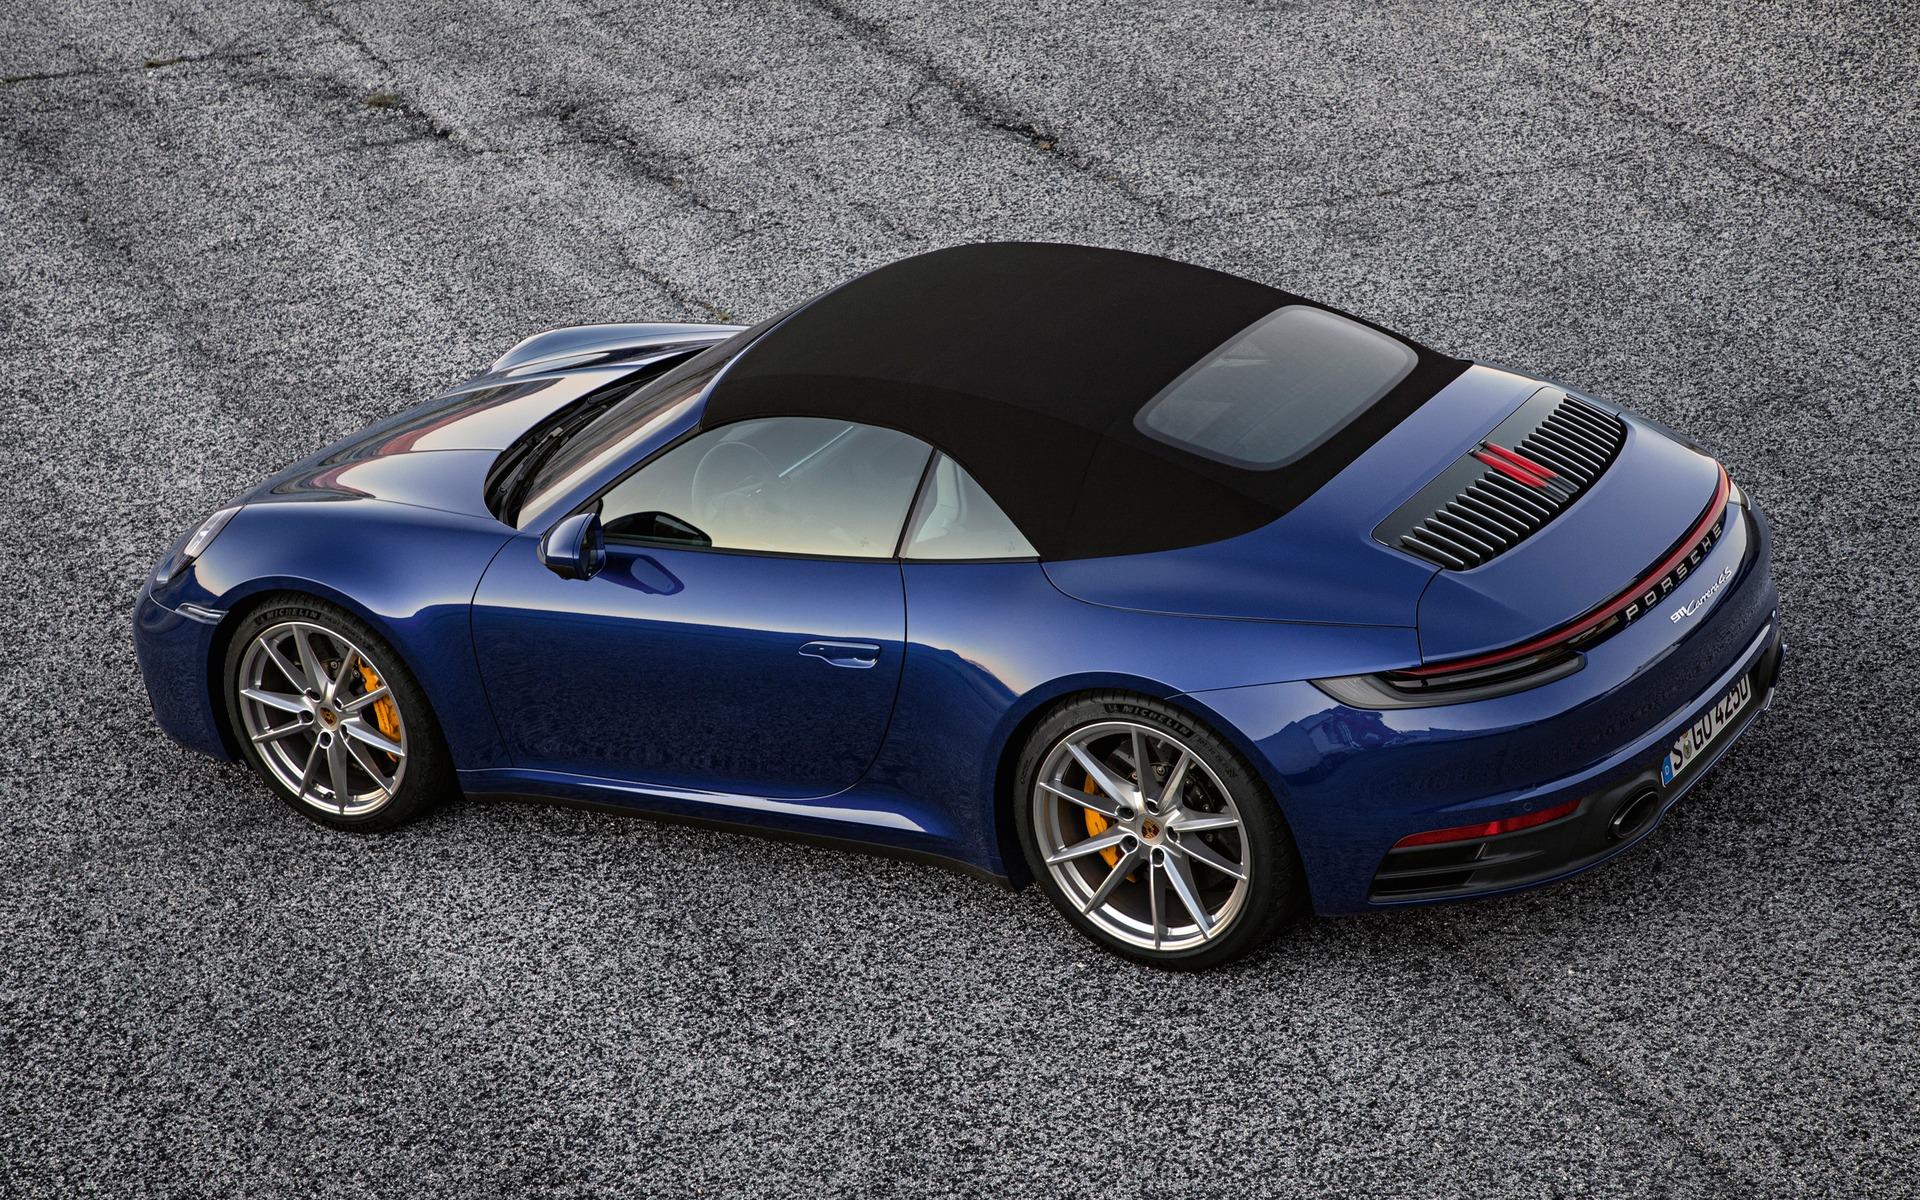 Voici la Porsche 911 Carrera Cabriolet 2020 362241_2020_Porsche_911